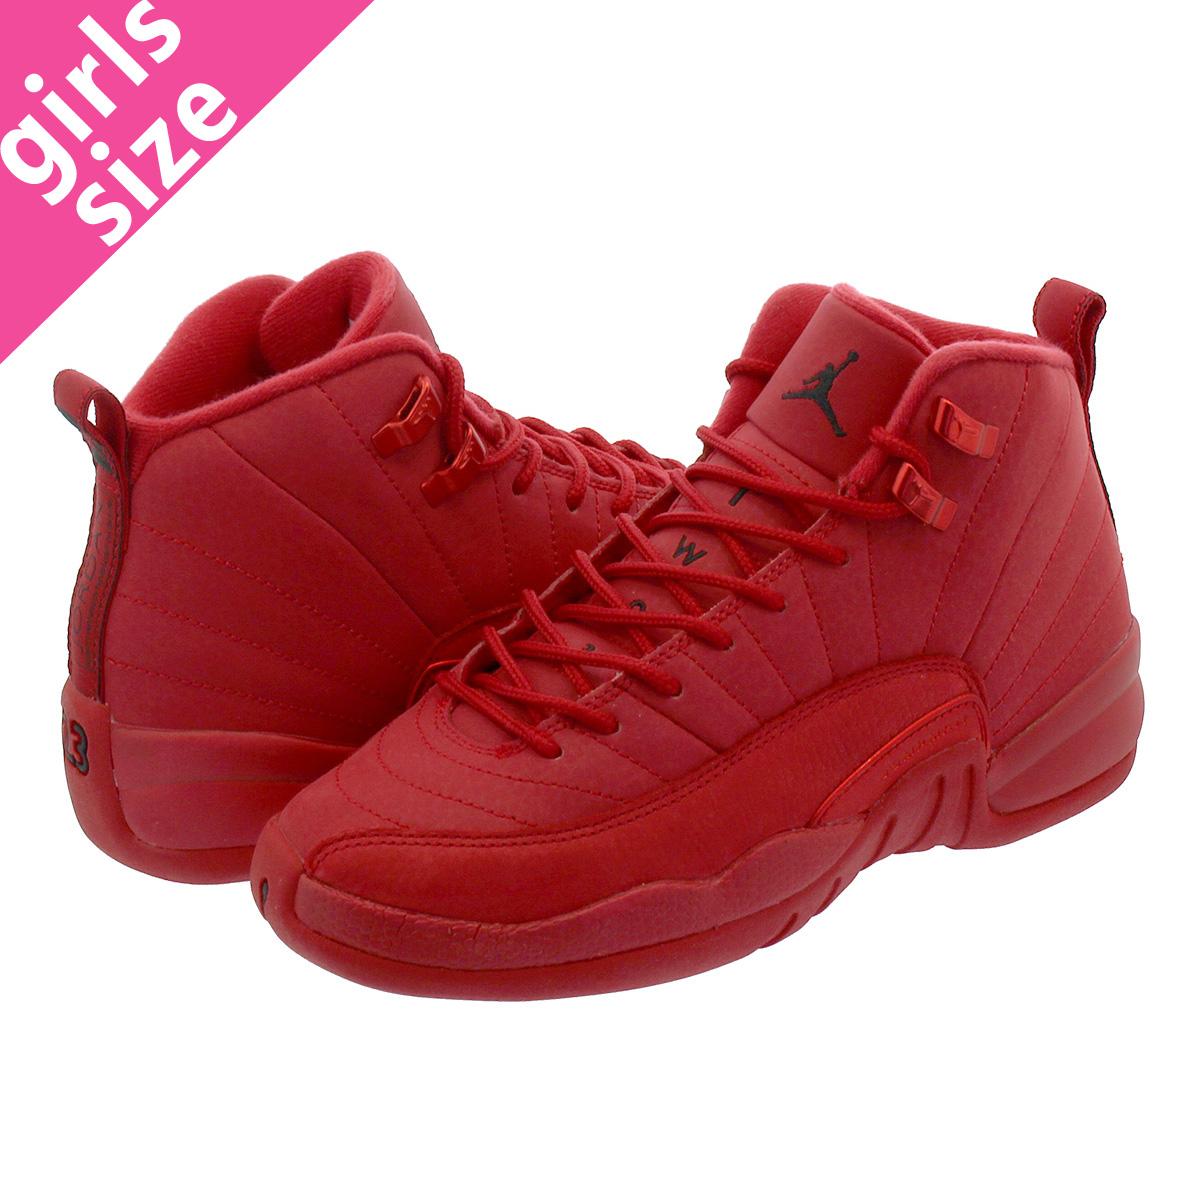 aed315c67285 LOWTEX BIG-SMALL SHOP  NIKE AIR JORDAN 12 RETRO GS Nike Air Jordan 12  nostalgic GS GYM RED BLACK 153